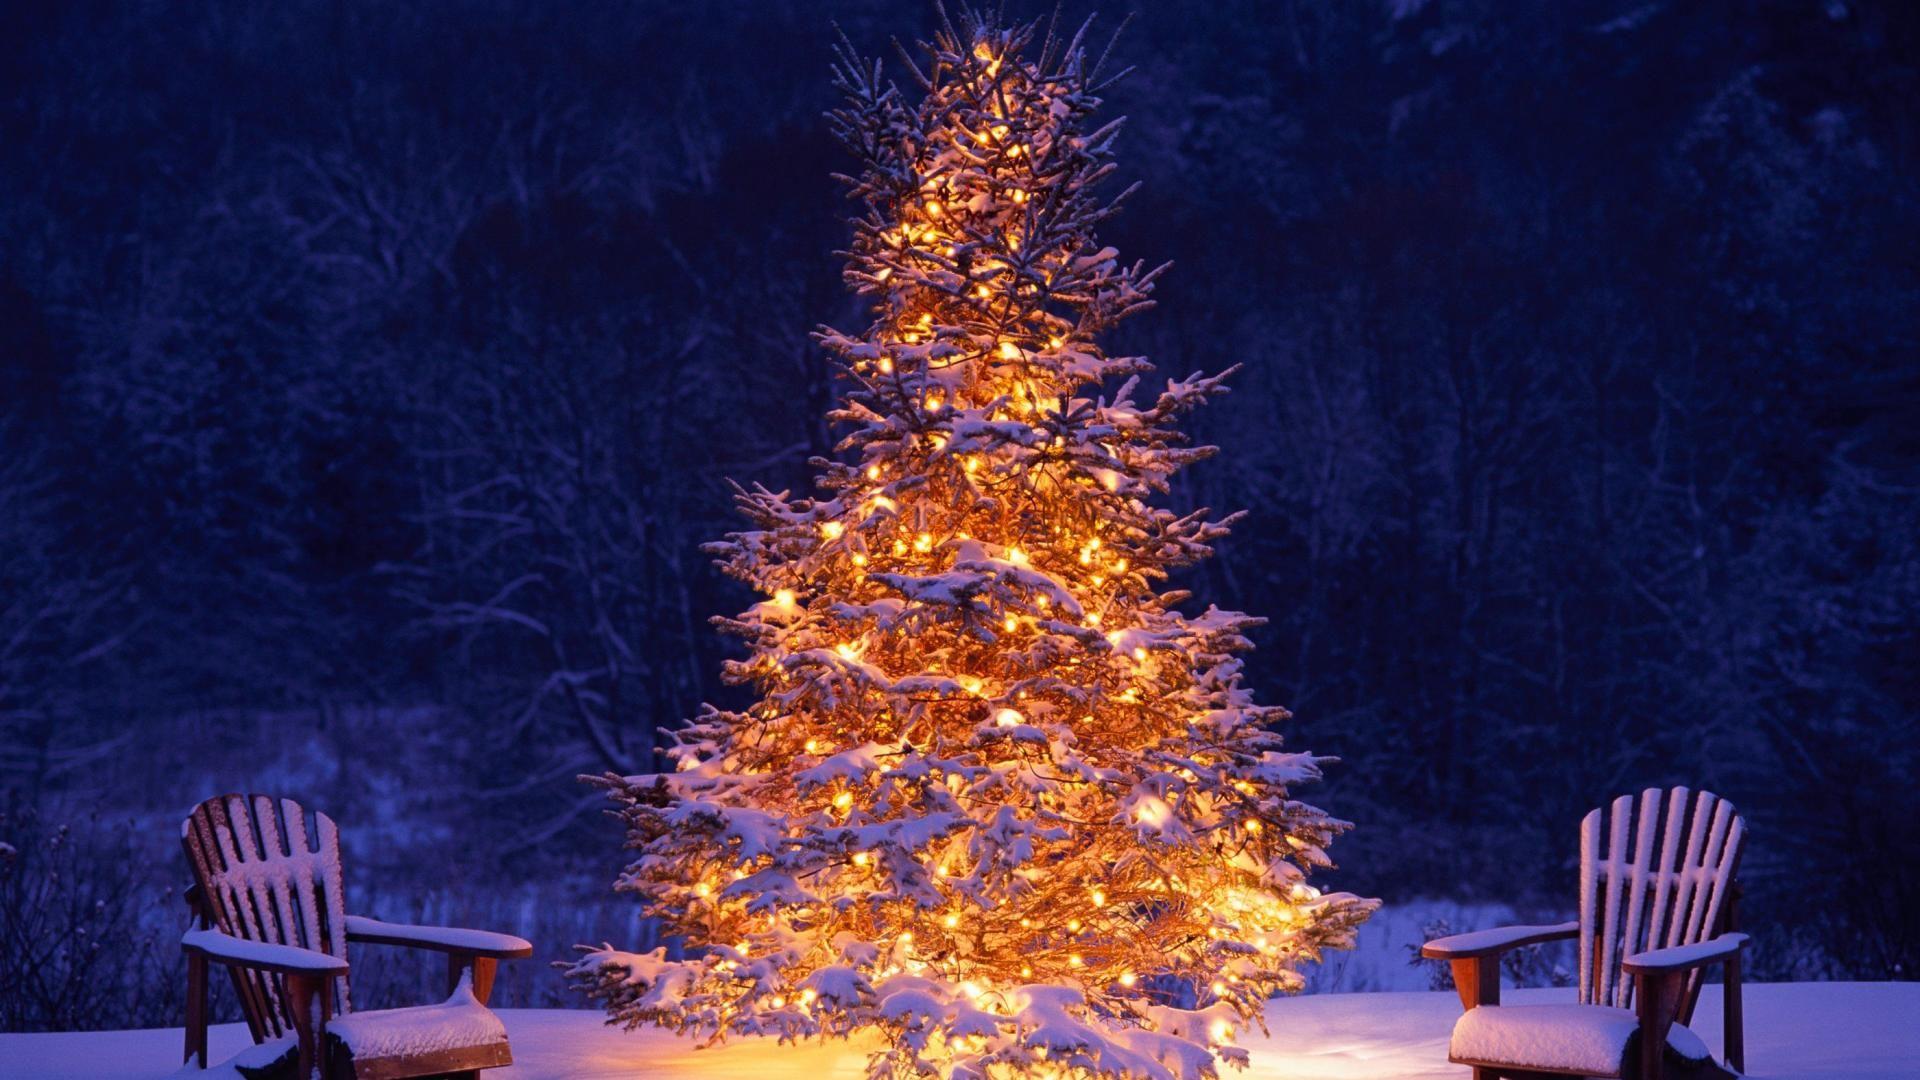 Hd Wallpaper Christmas Tree Snow